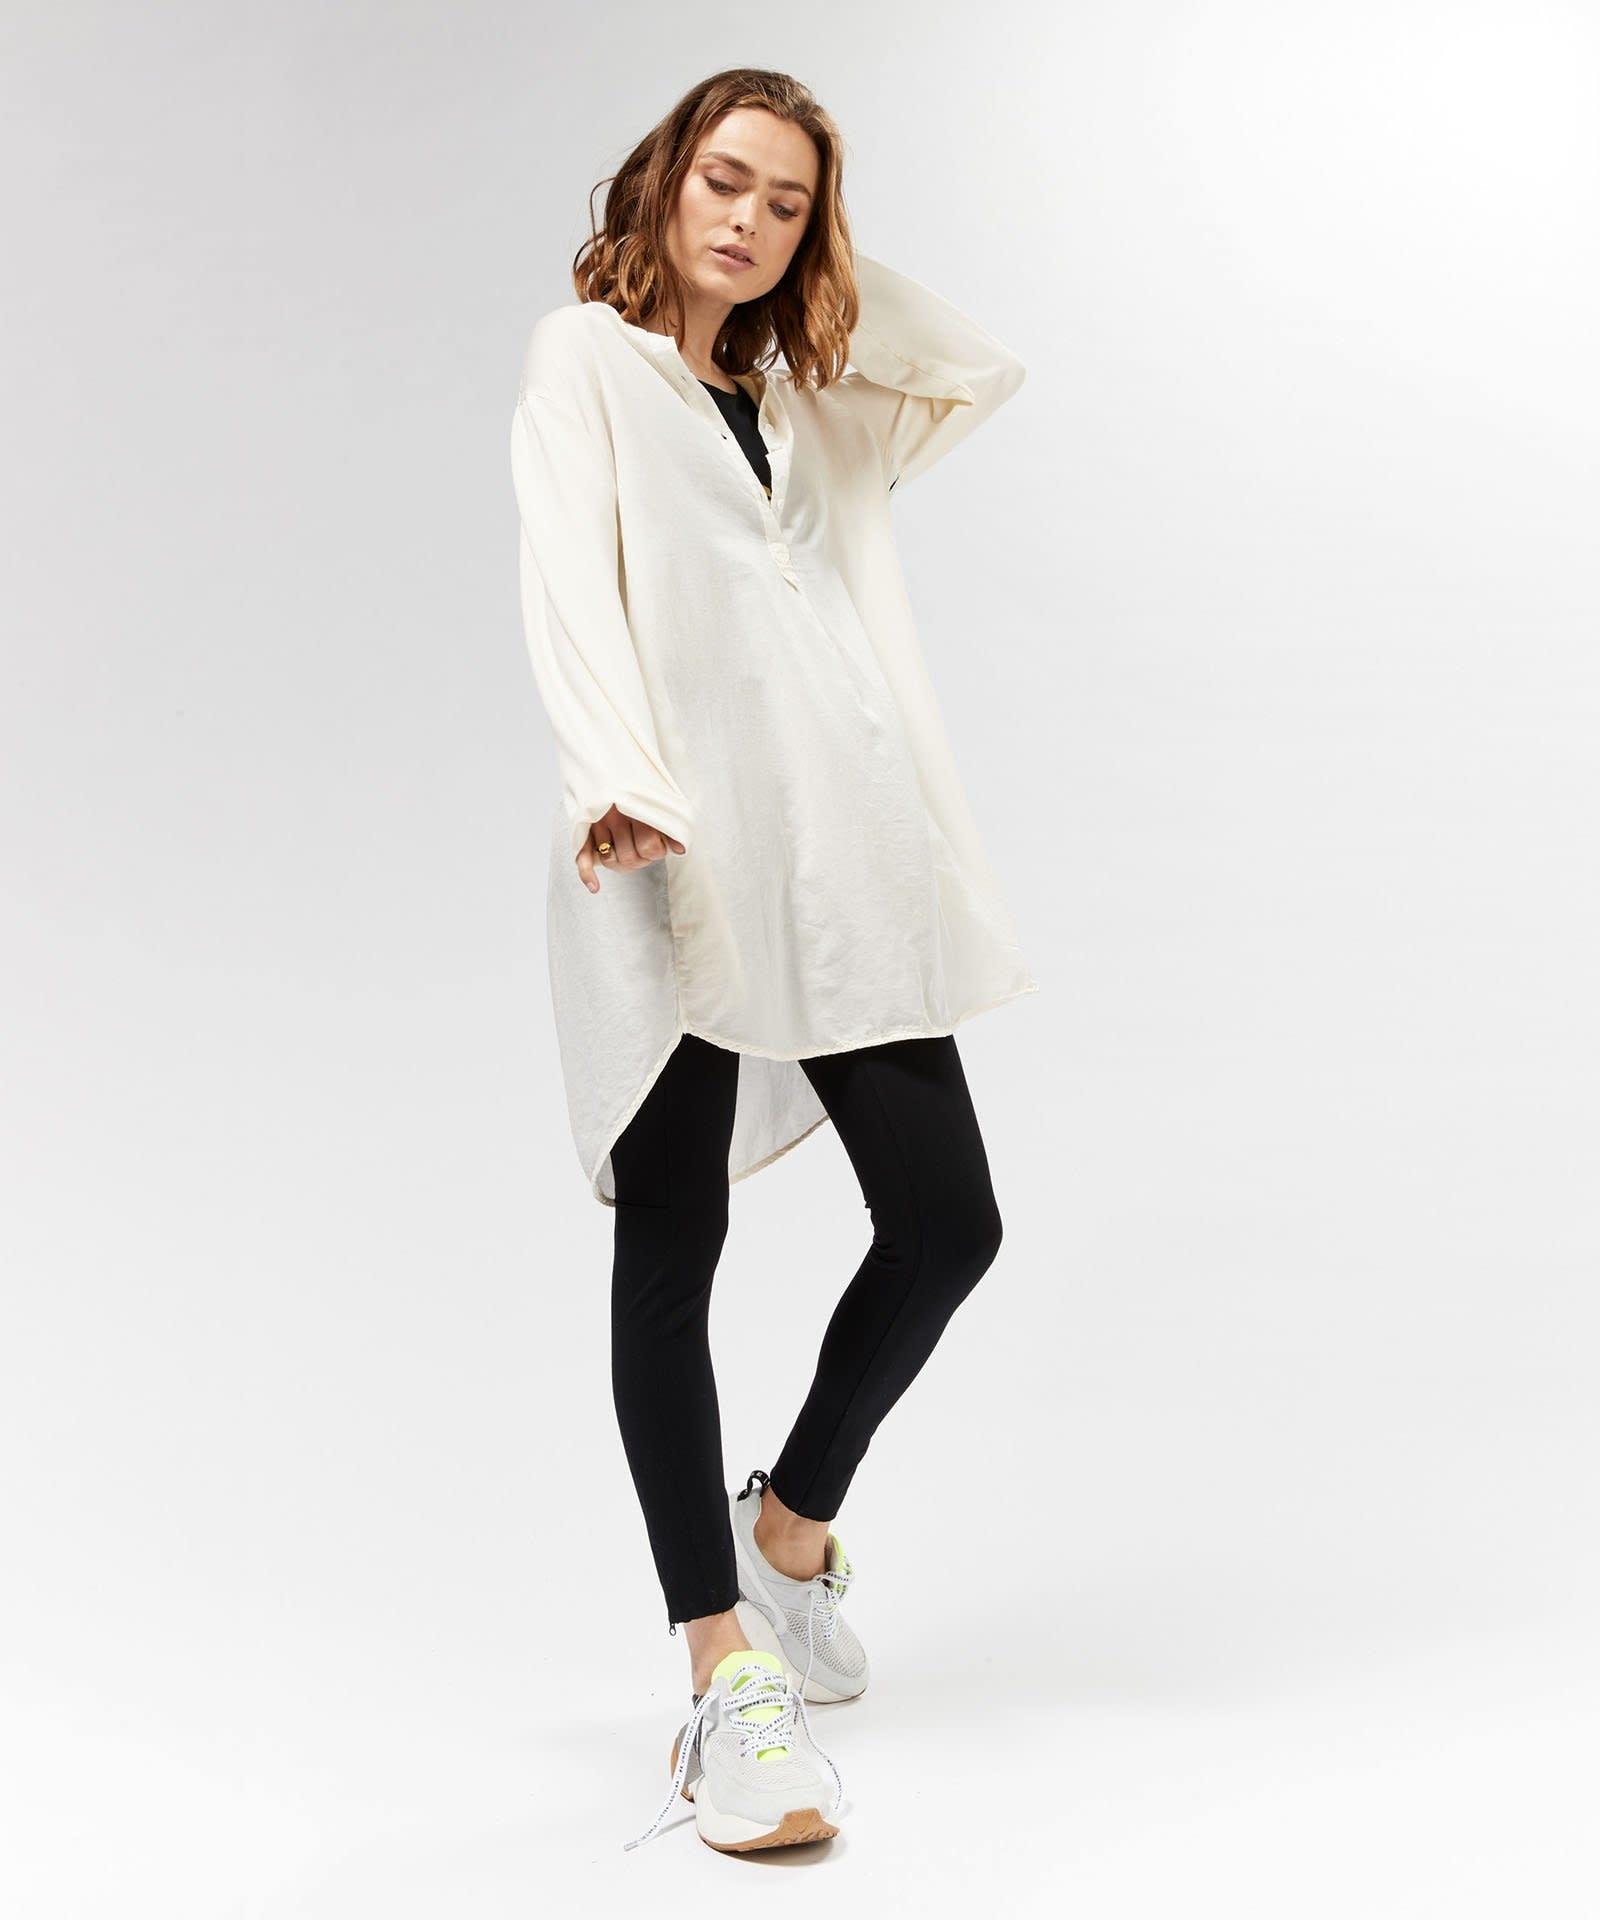 Blouse tunic silk white-2